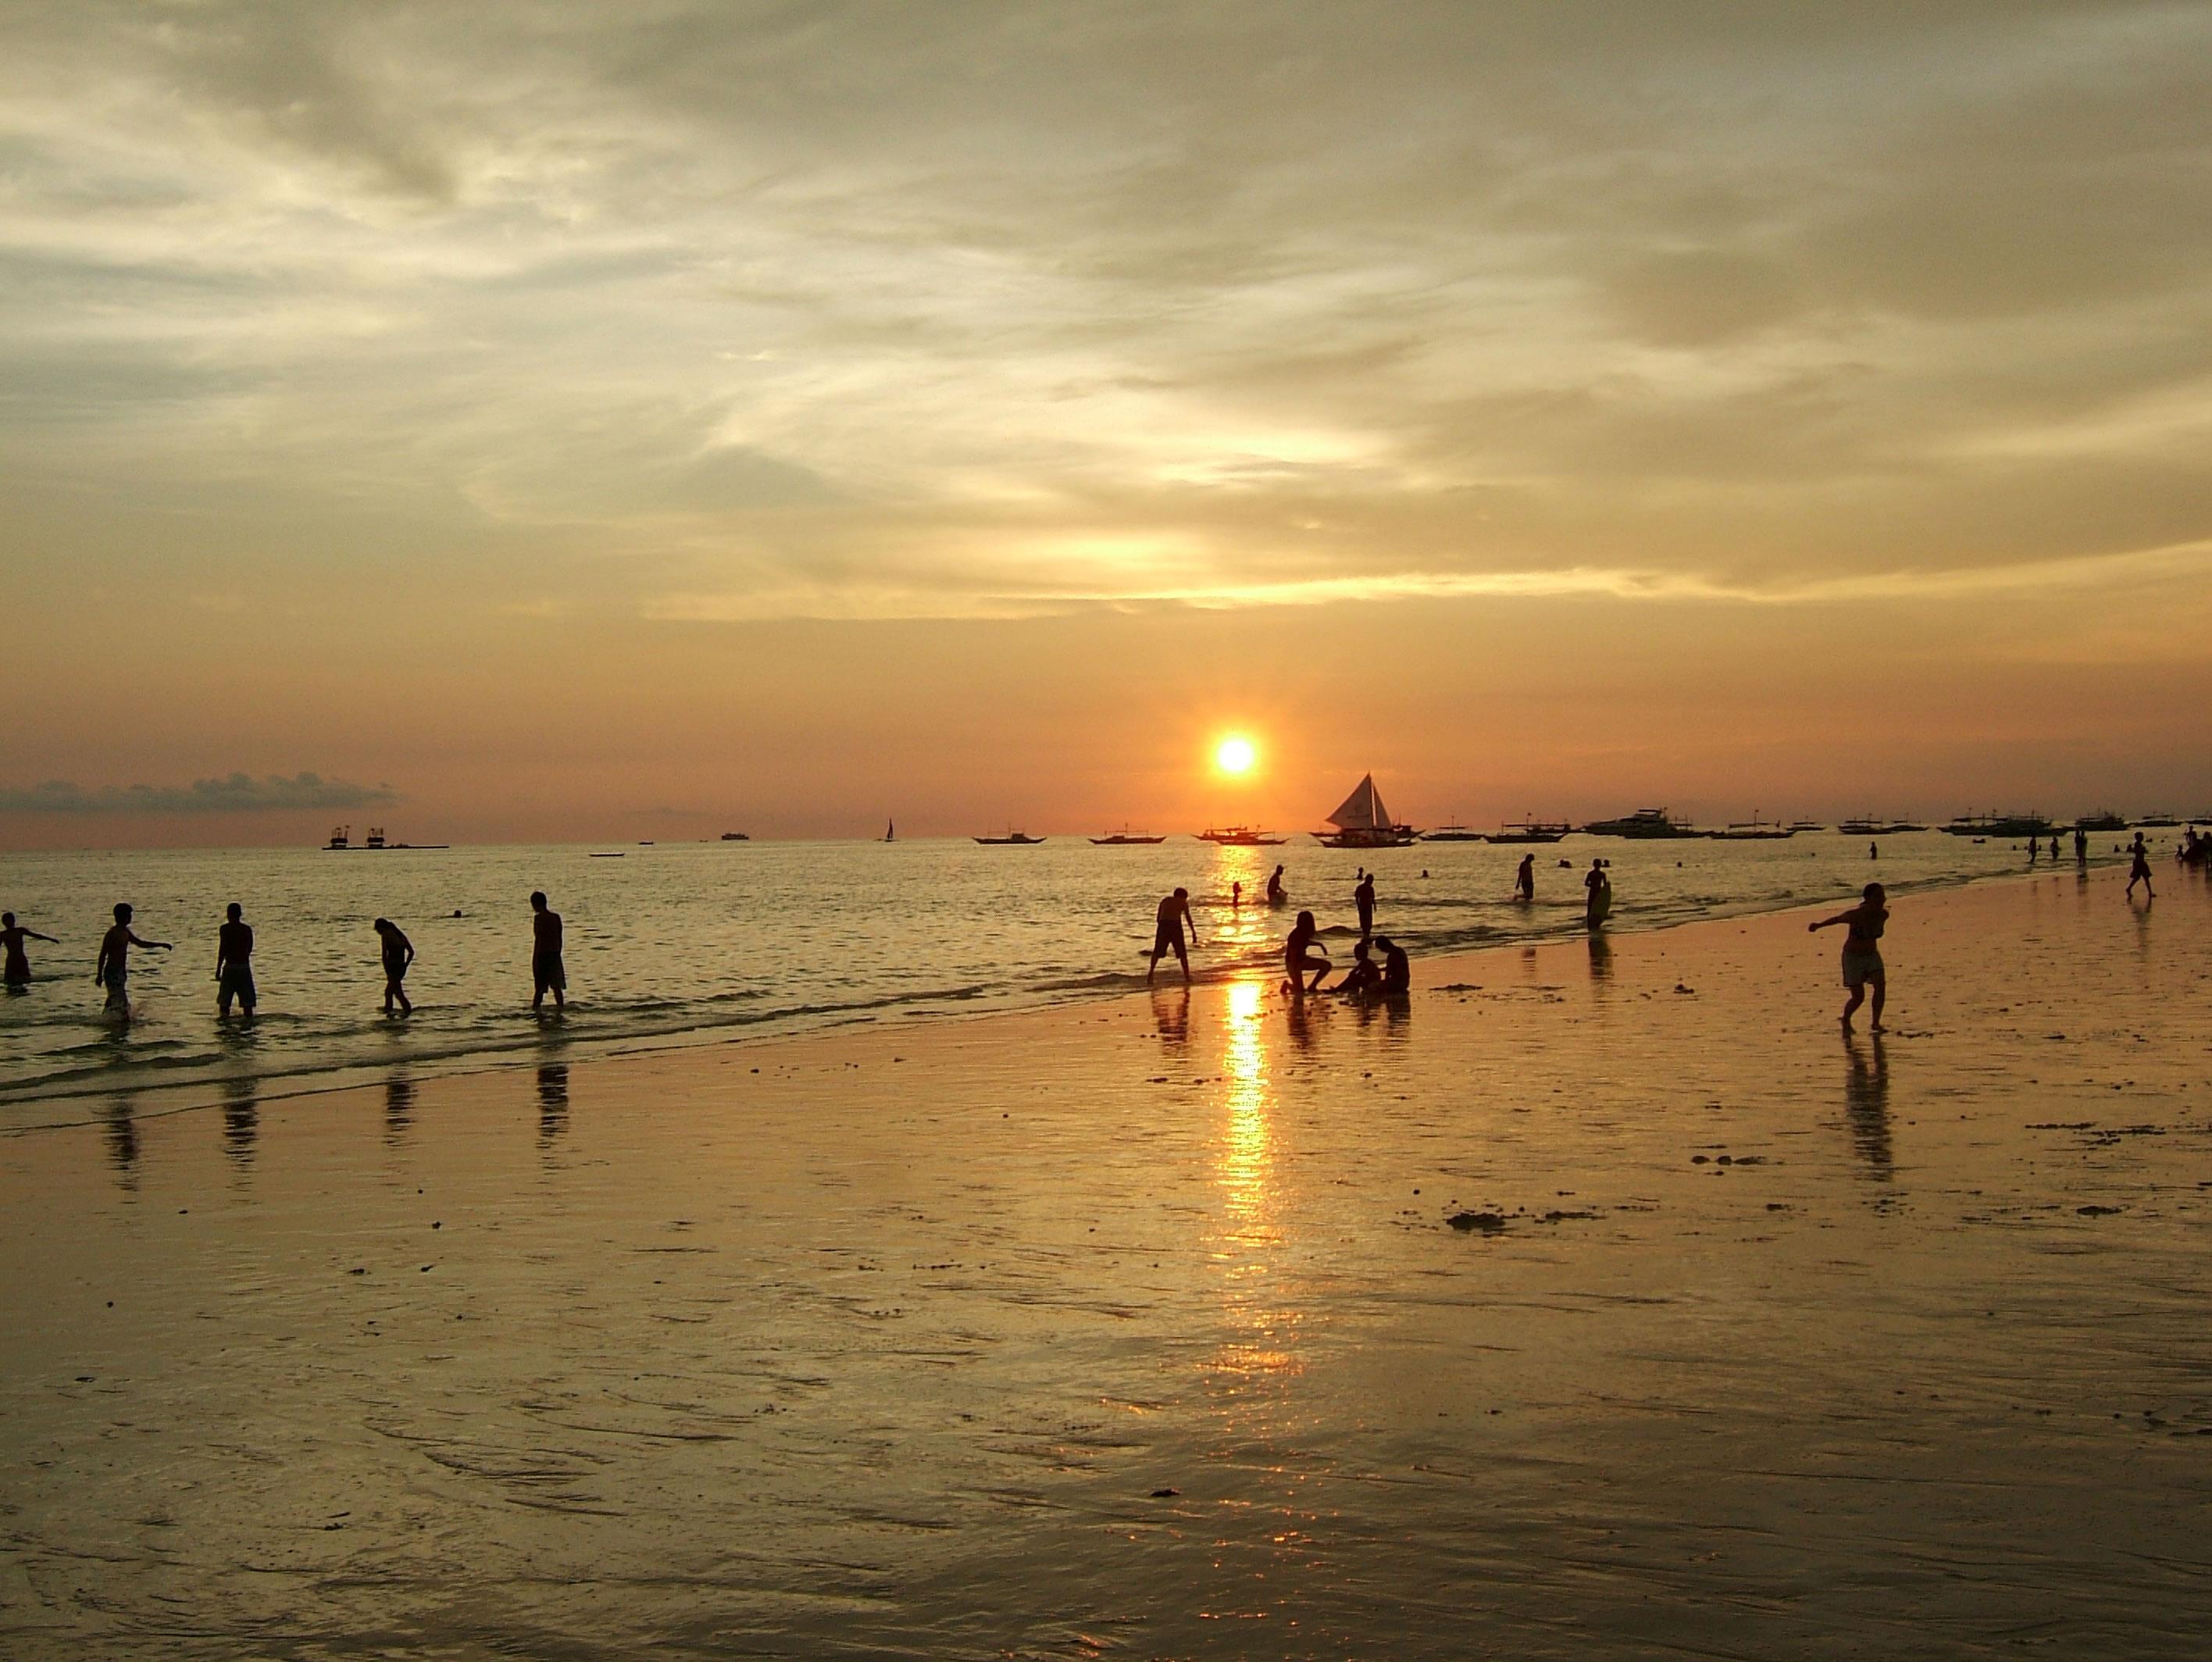 Philippines Sugar Islands Caticlan Boracay White Beach Sunset 2007 18